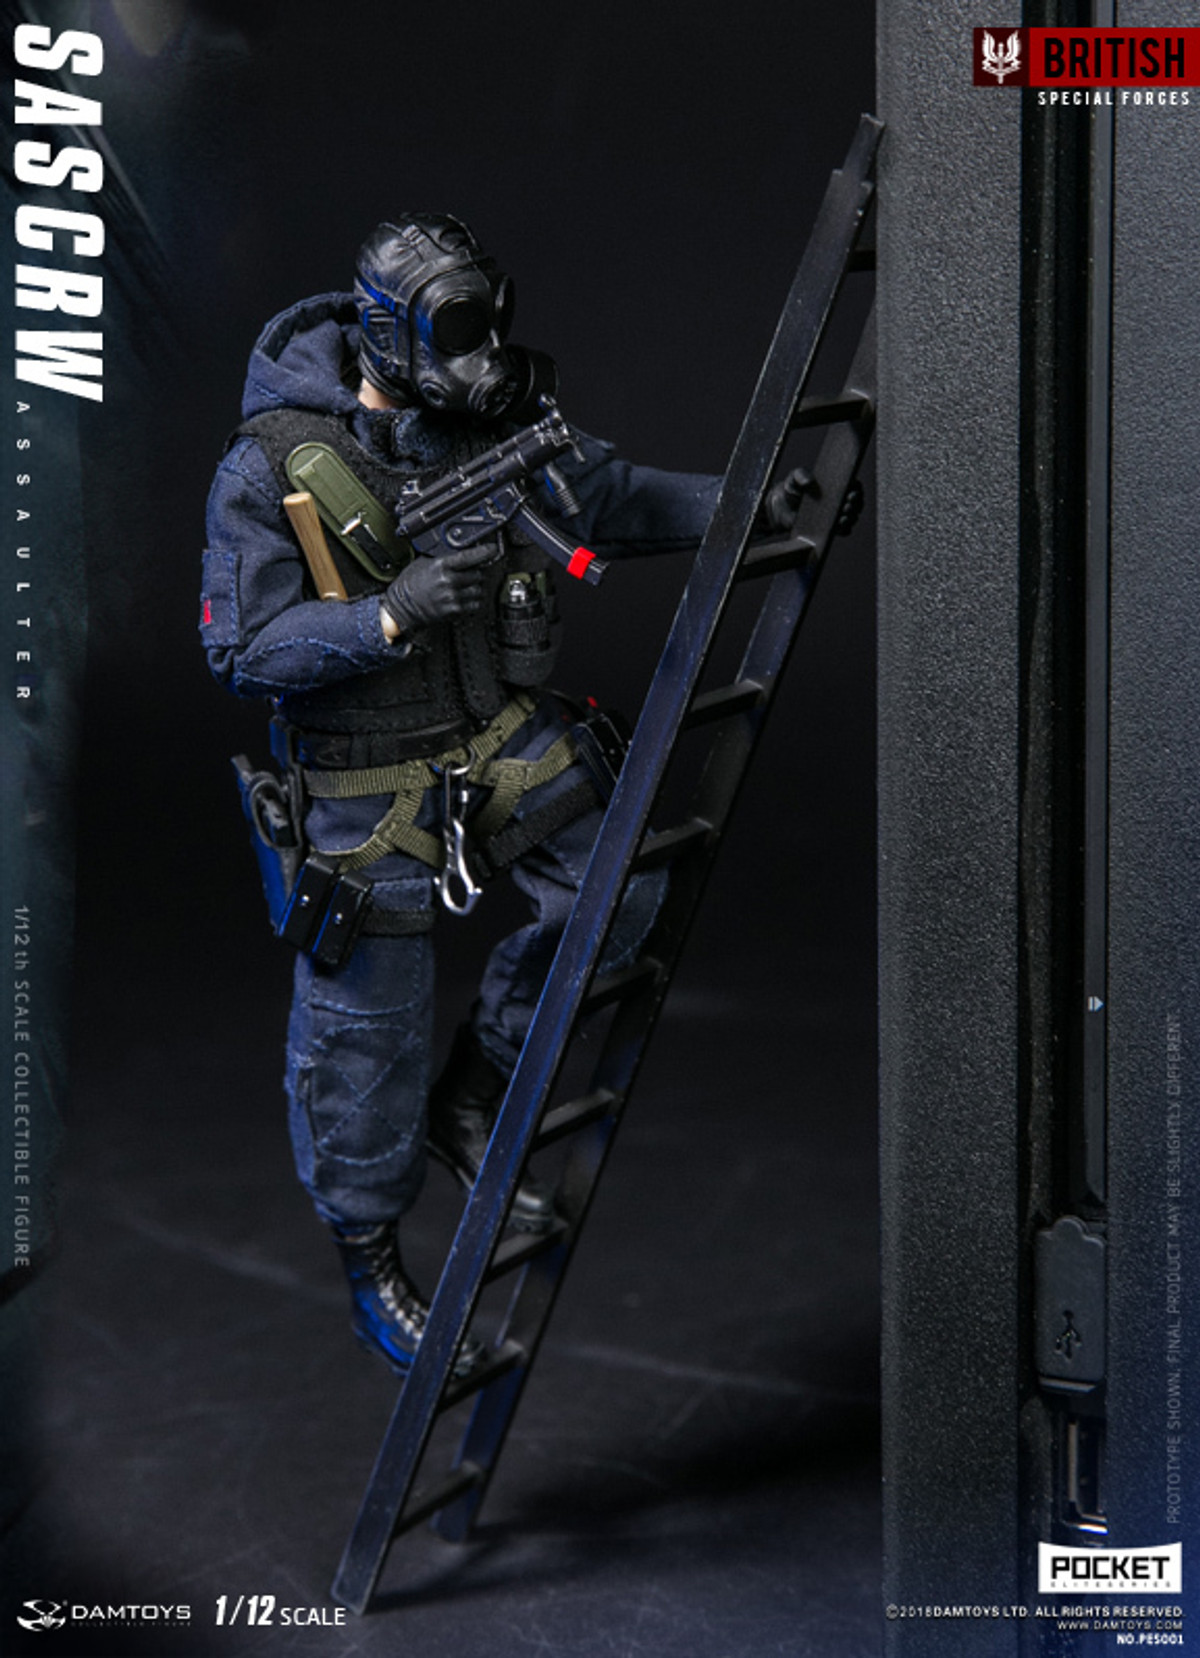 British Special Forces Pocket Elite Series SAS CRW Assaulter 1//12 Scale Figure